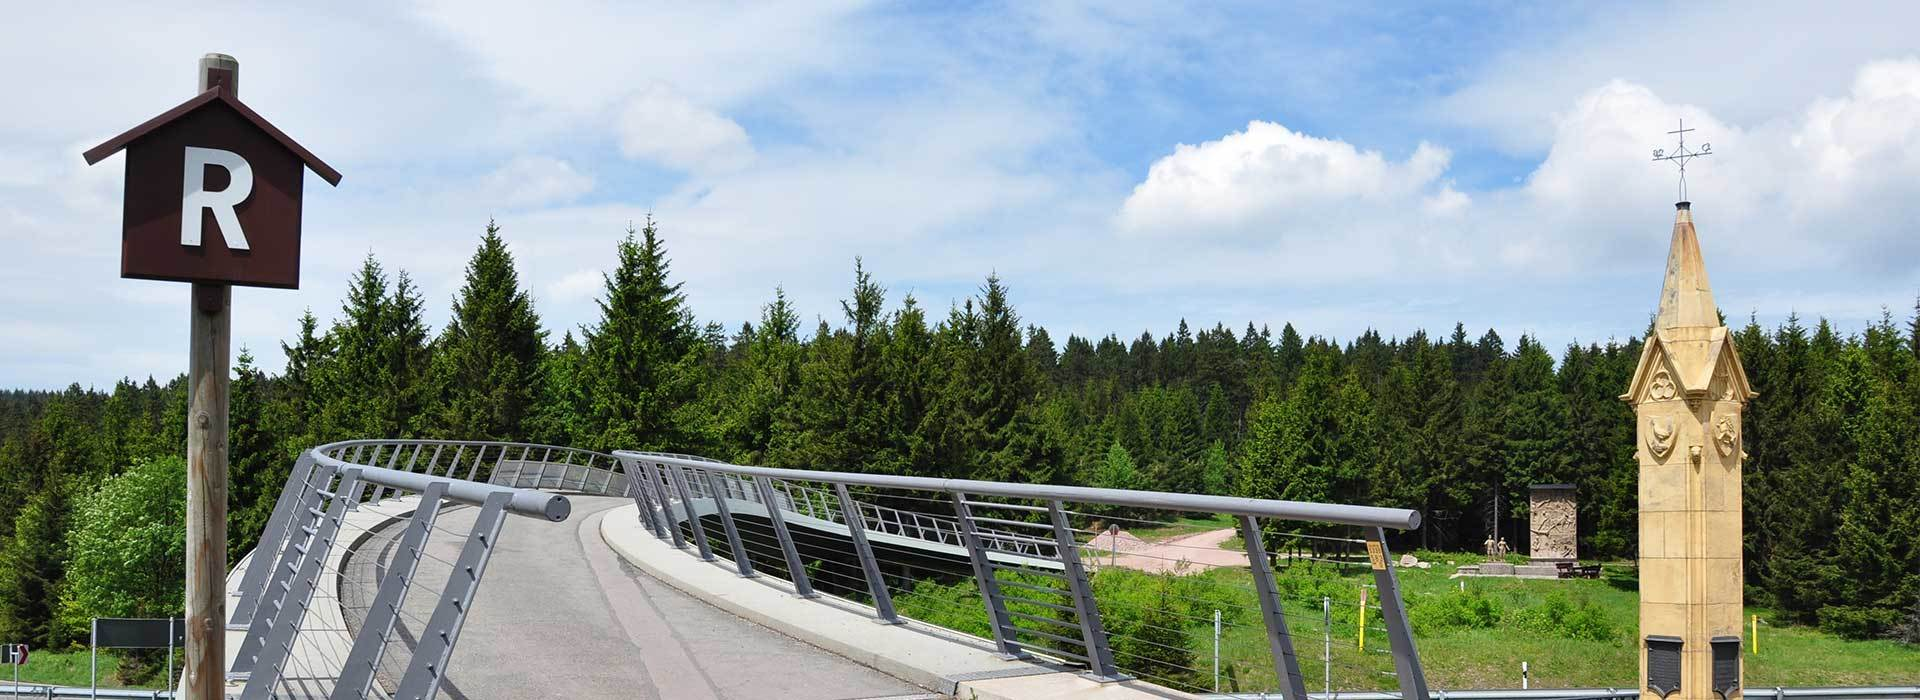 Gruppenreise Rennsteigtage Oberhof | Bild Rondell Oberhof mit Rennsteig Beschilderung | © Henry Czauderna - fotolia.com